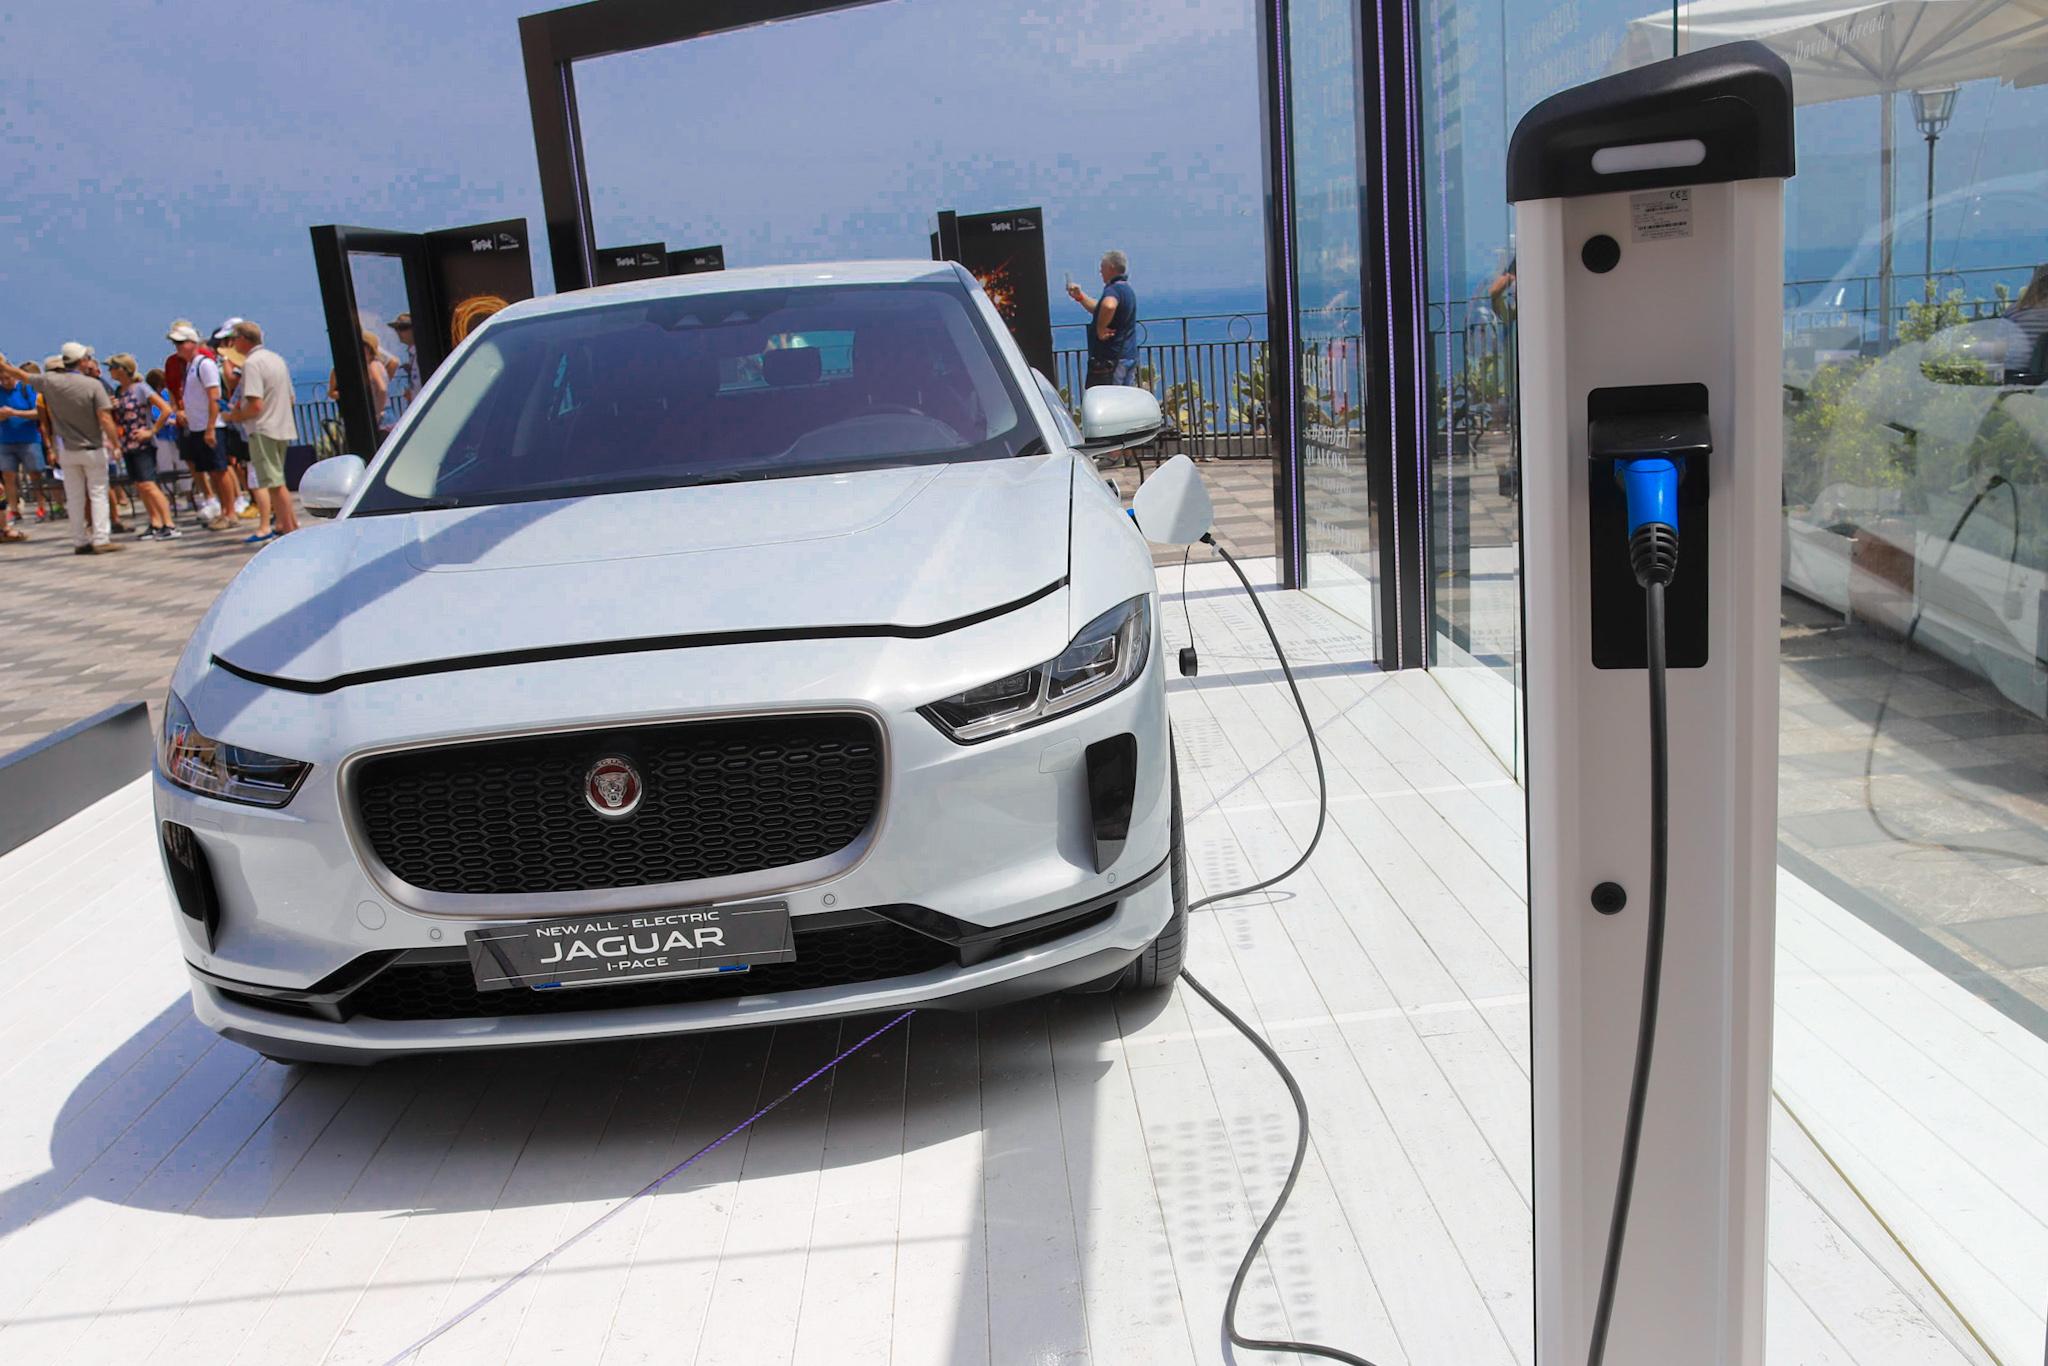 V2E - Vehicle-to-Electric